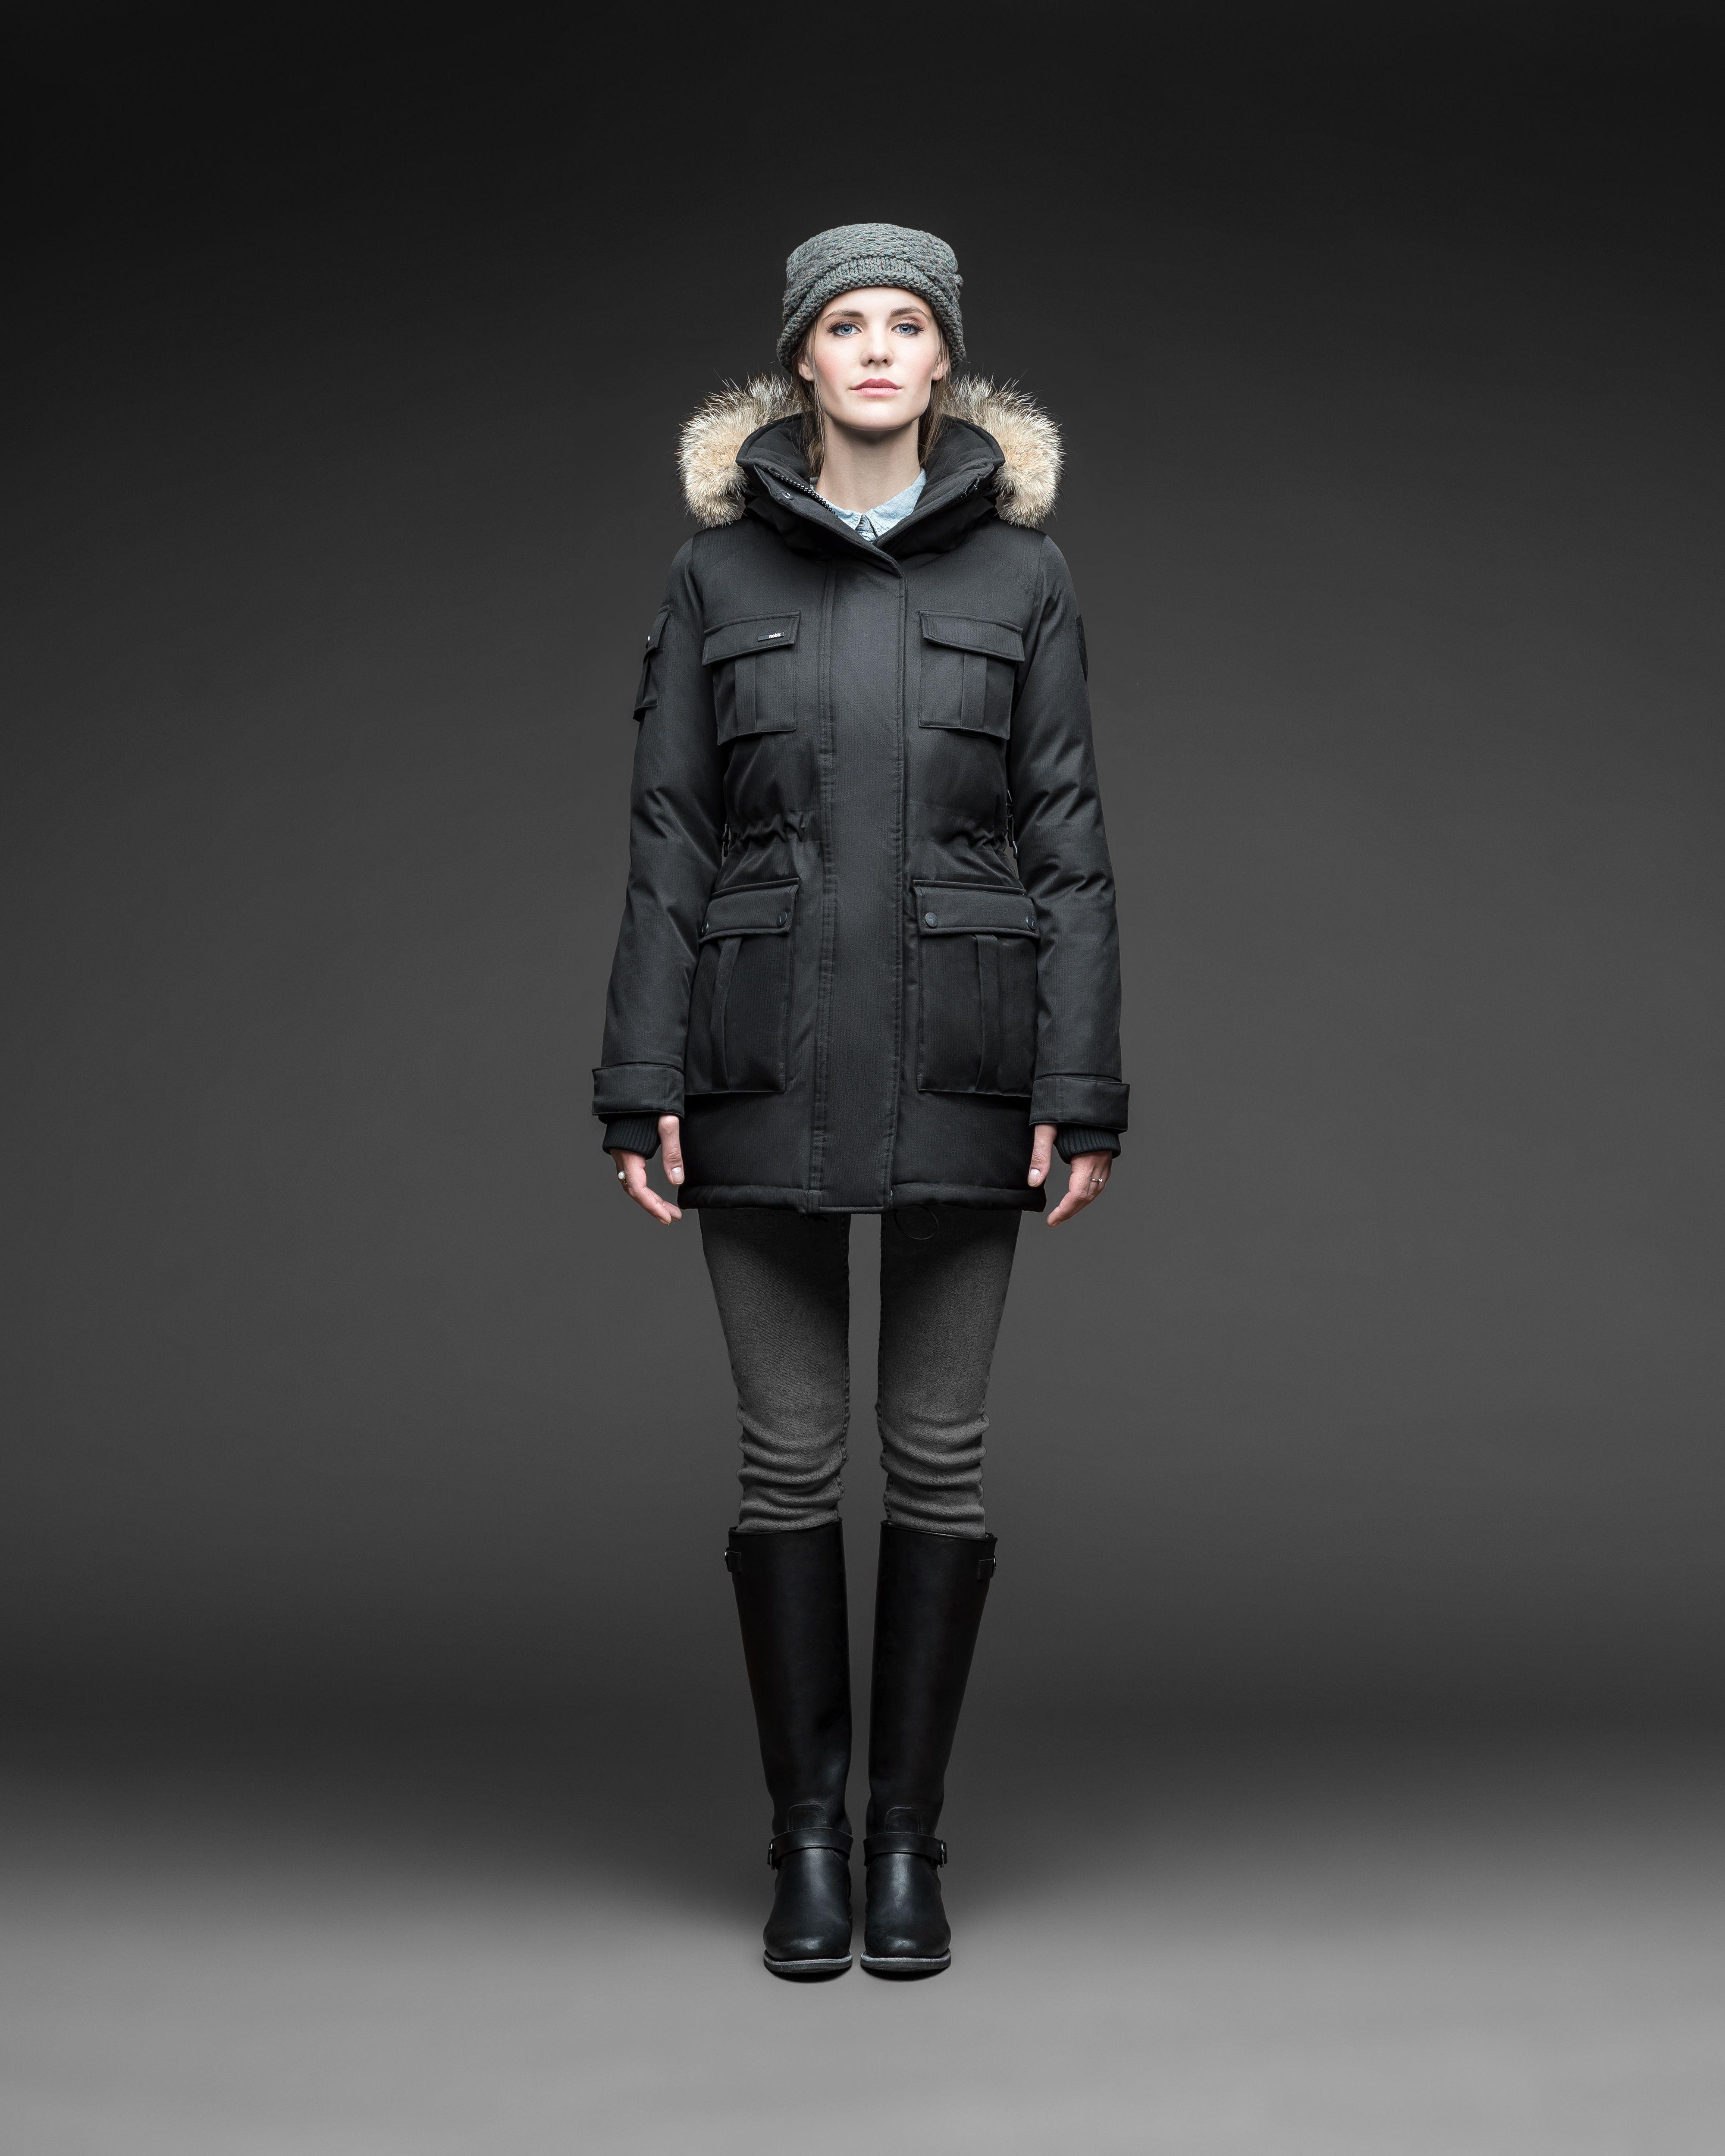 08d53b0d7 nobis Cindy Crosshatch black www.nobis.ca | Fall 14/15 | Winter ...